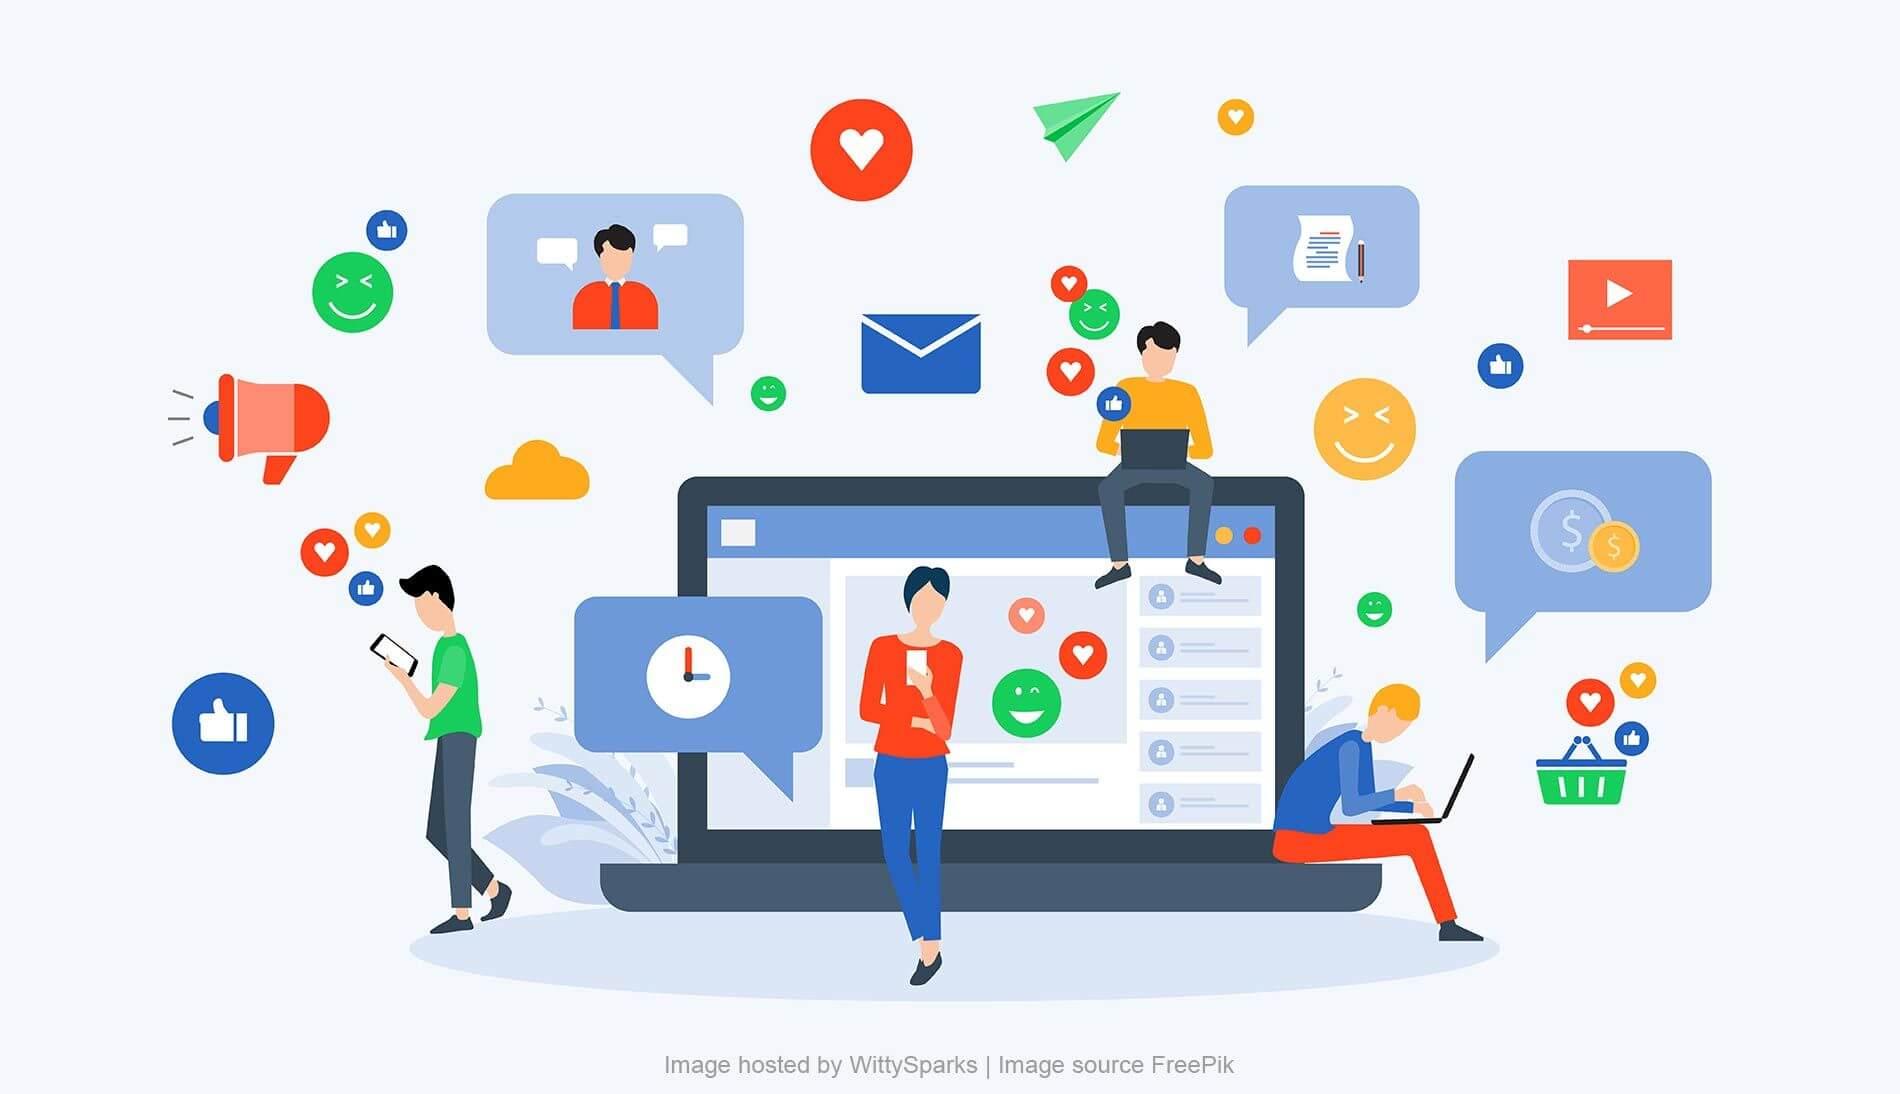 Better Social media analytics and Marketing Strategy